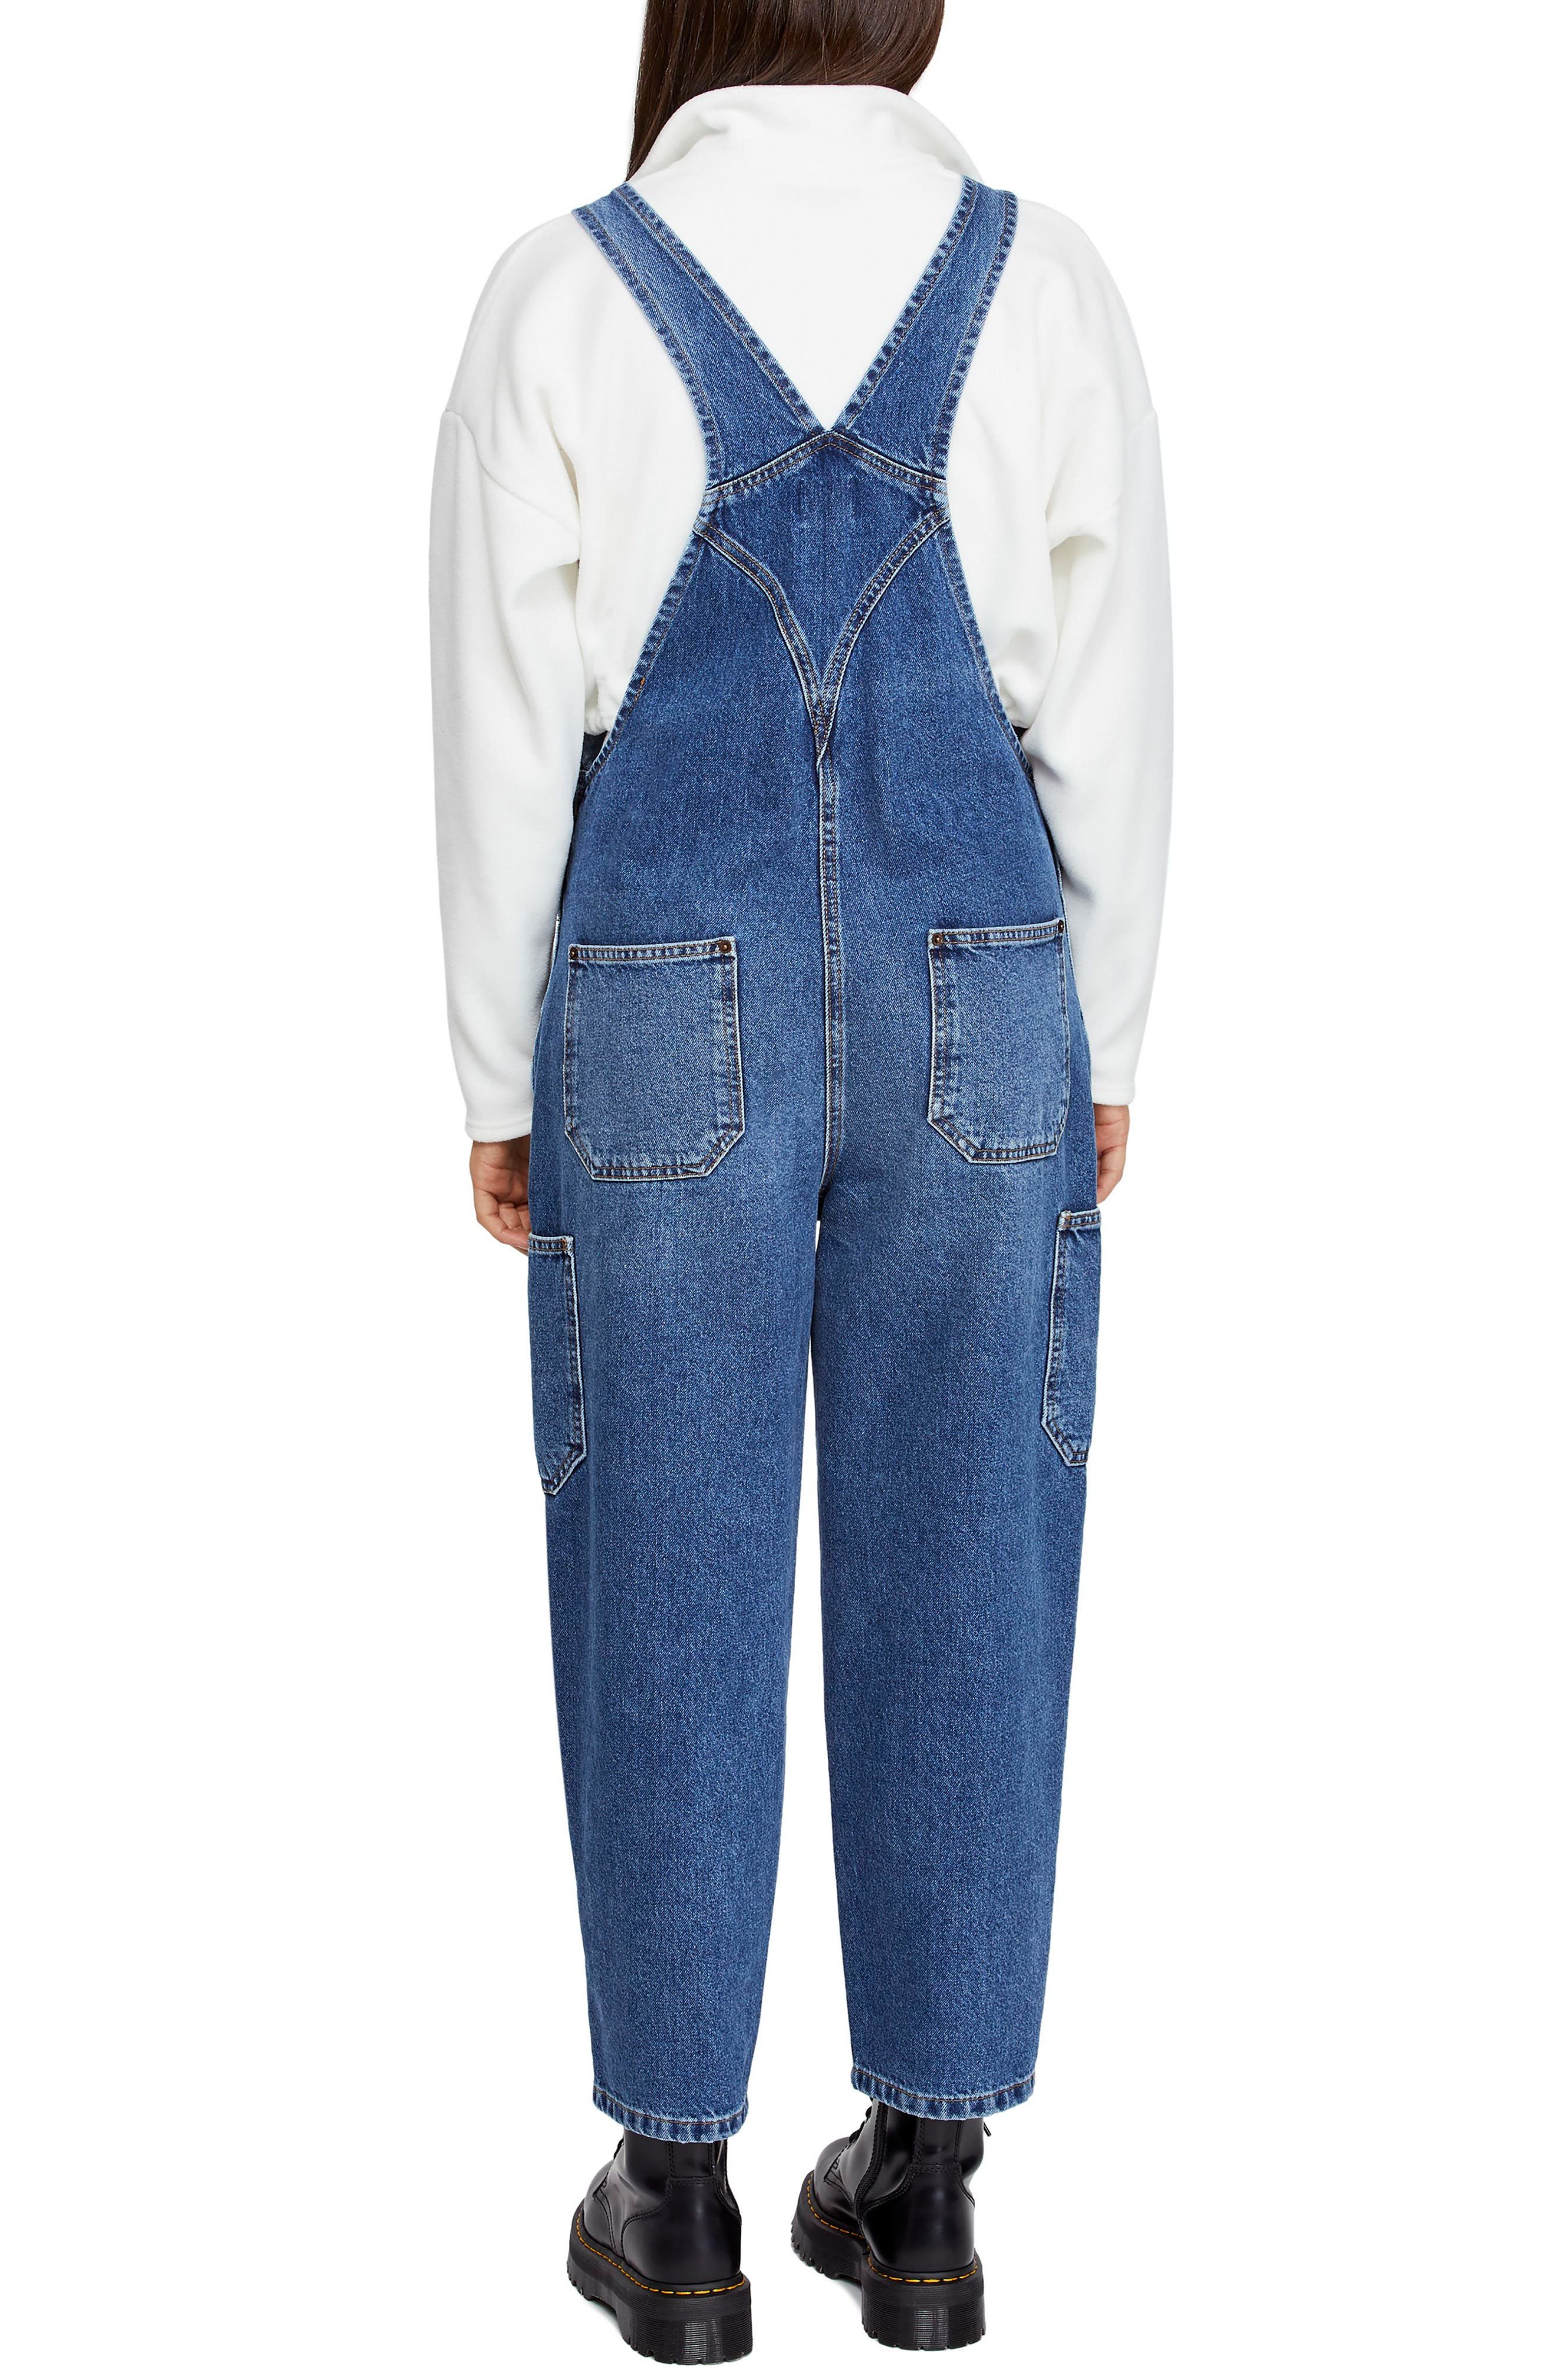 Urban Outfitters Workwear Denim Overalls,                             Alternate thumbnail 2, color,                             DENIM BLUE